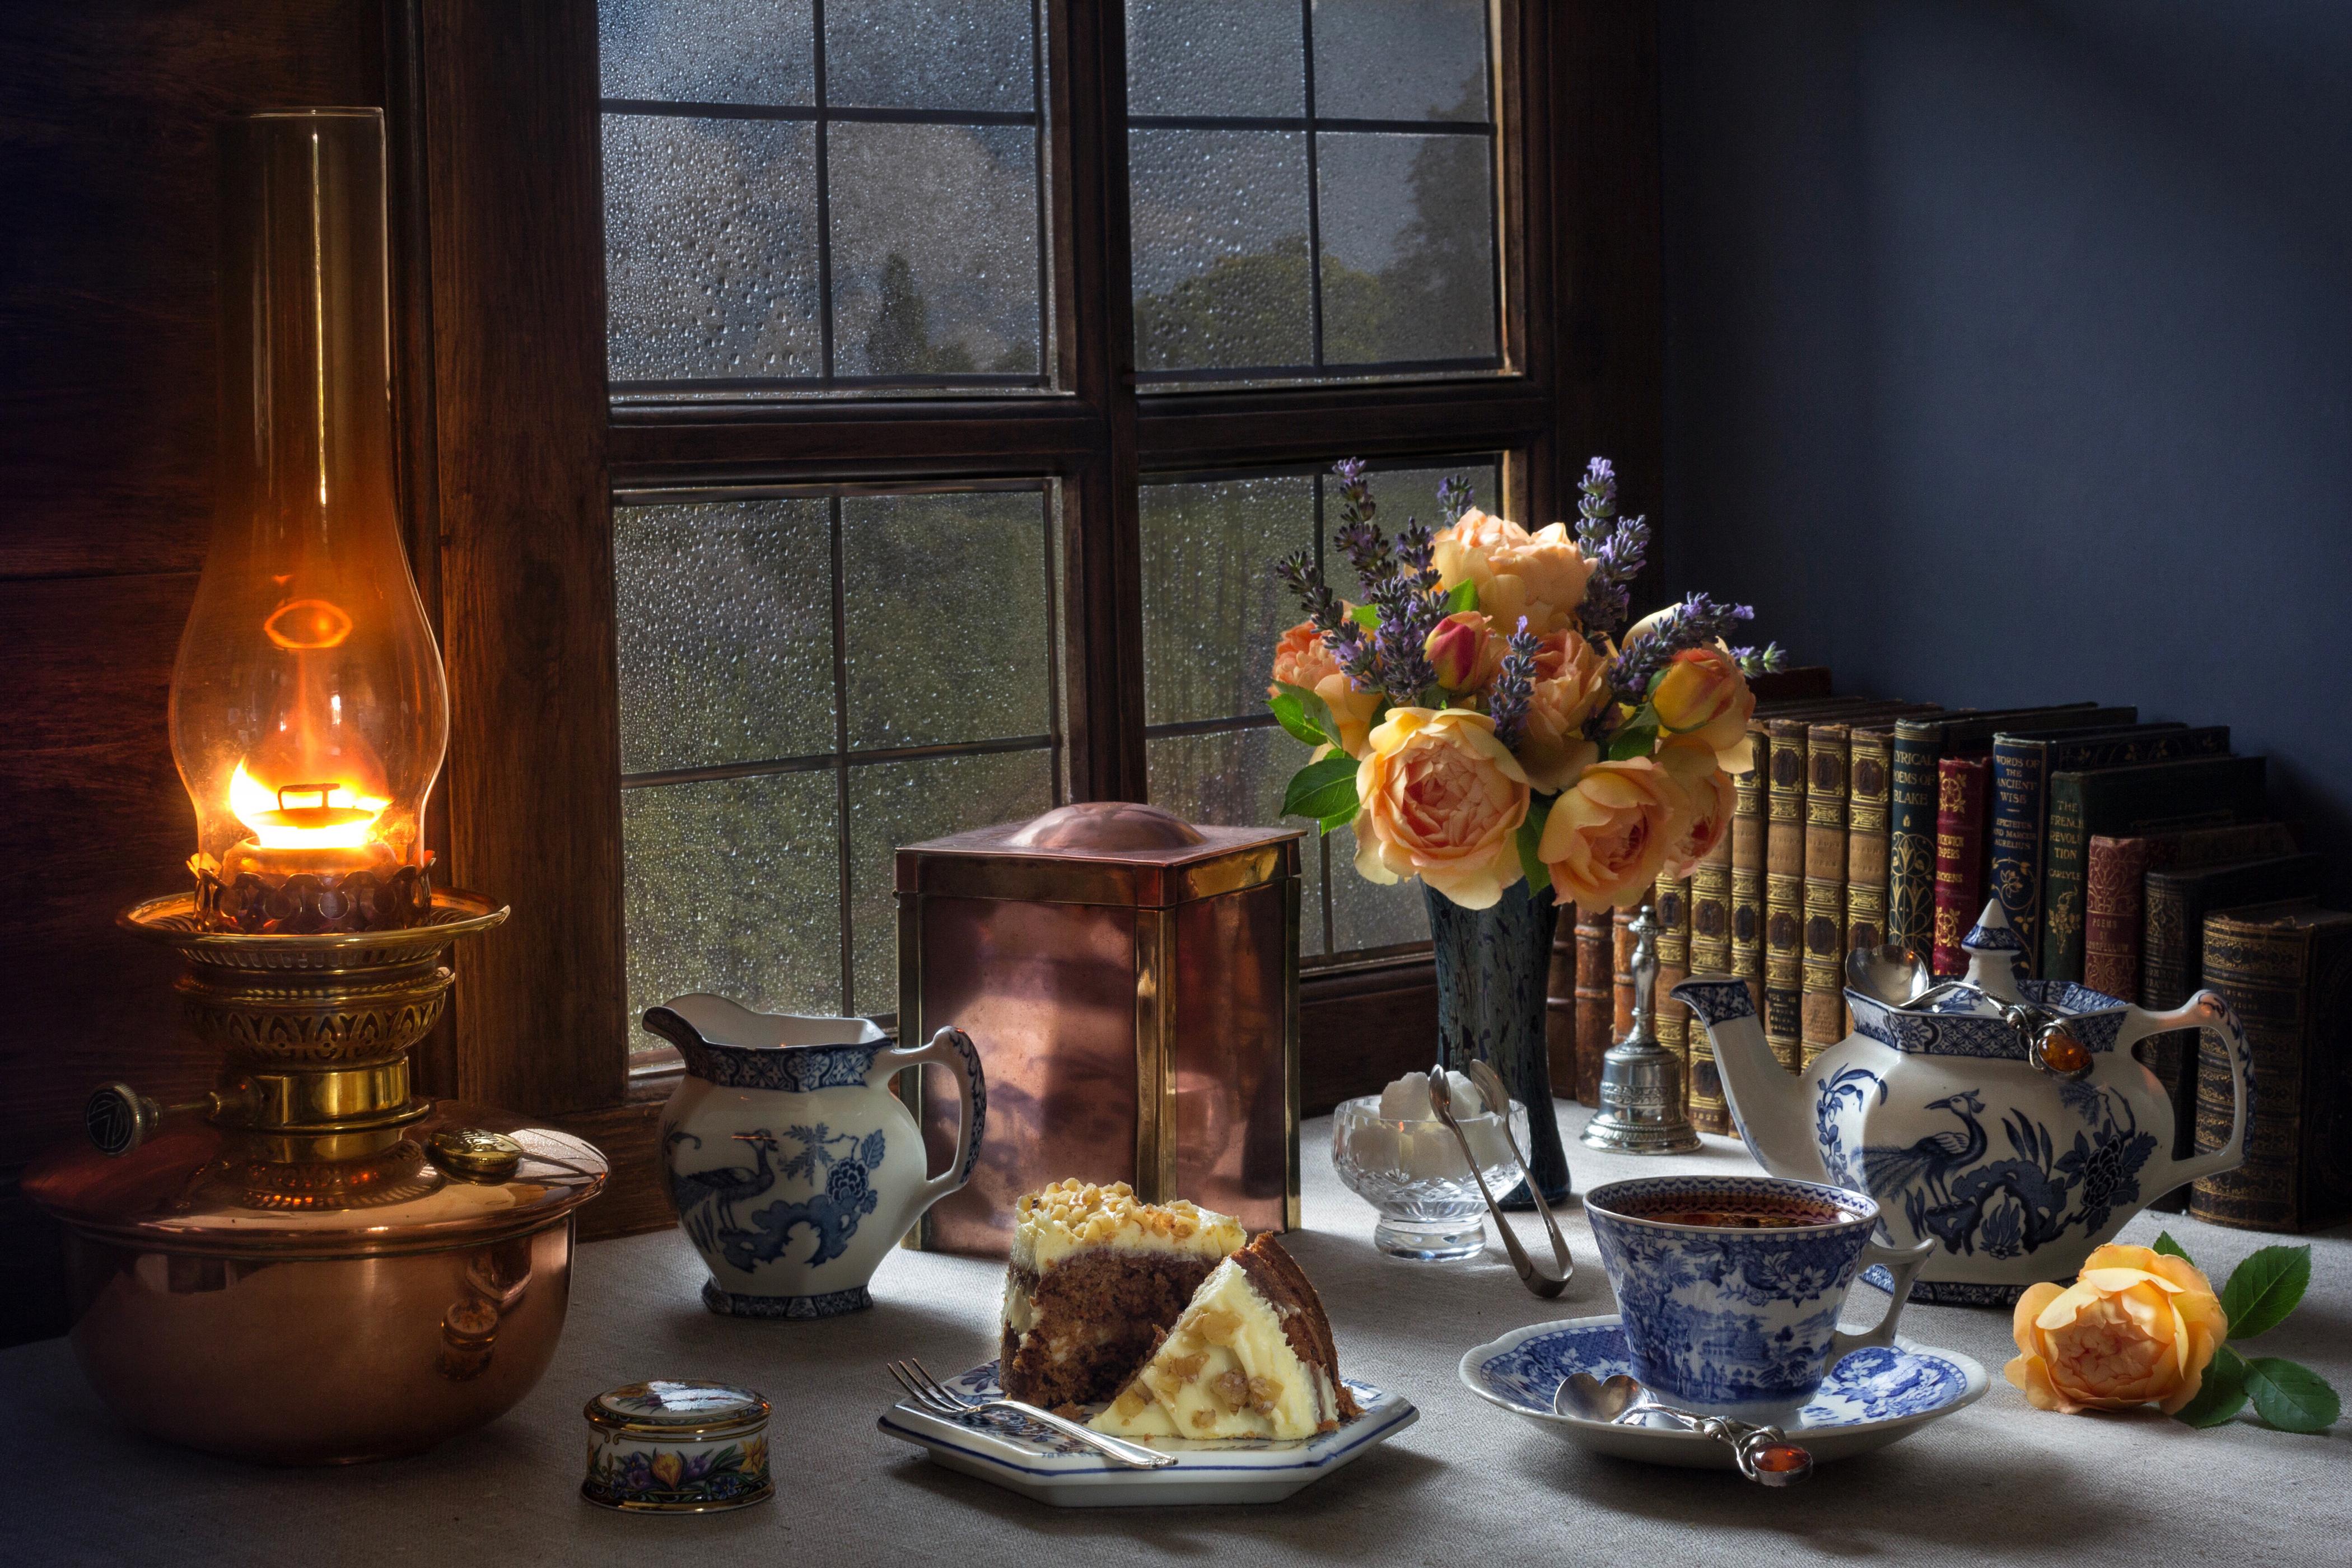 Still-life_Kerosene_lamp_Cake_Bouquets_R